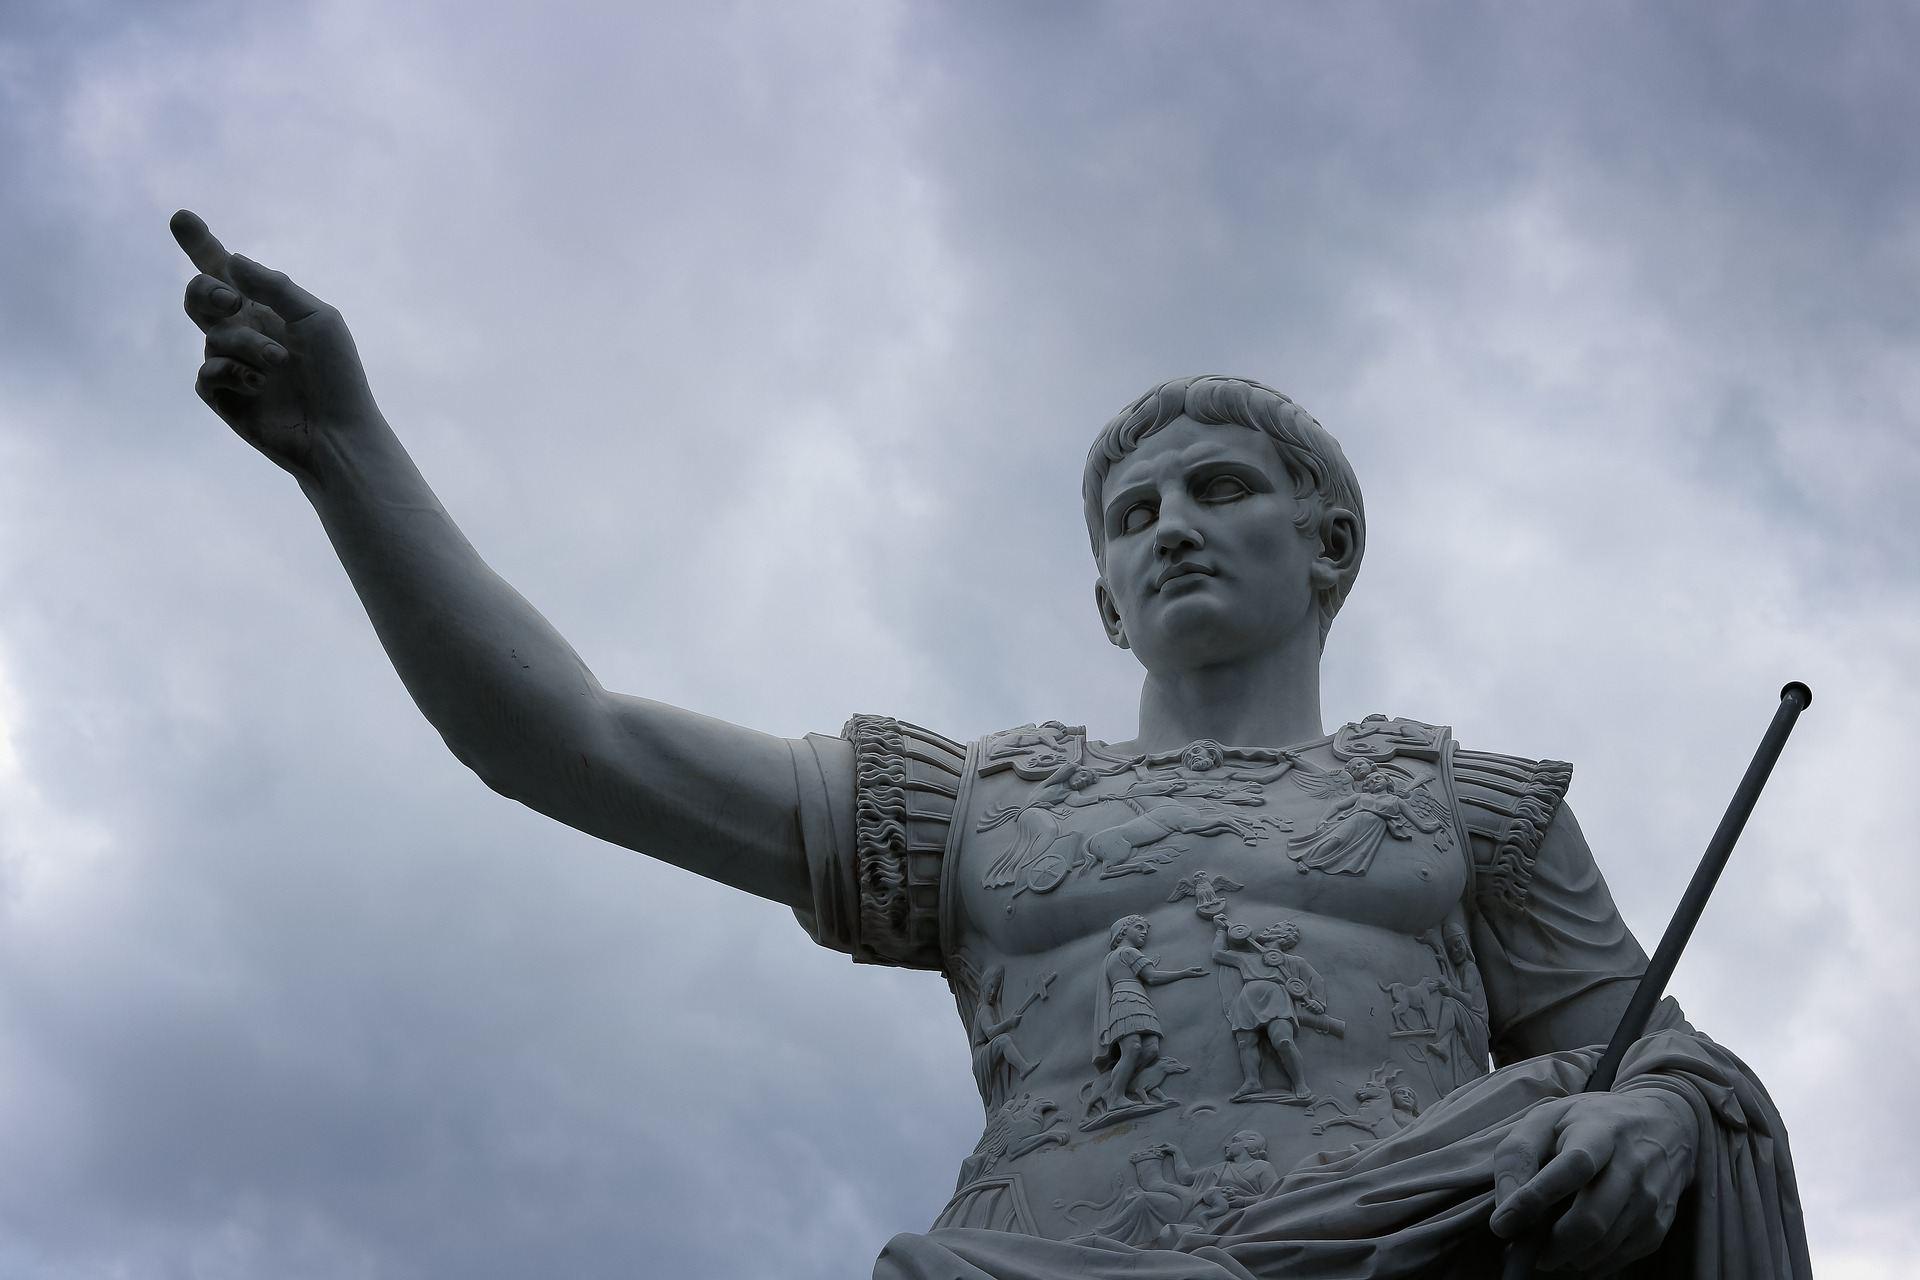 Statue of Julius Caesar against a stormy sky.